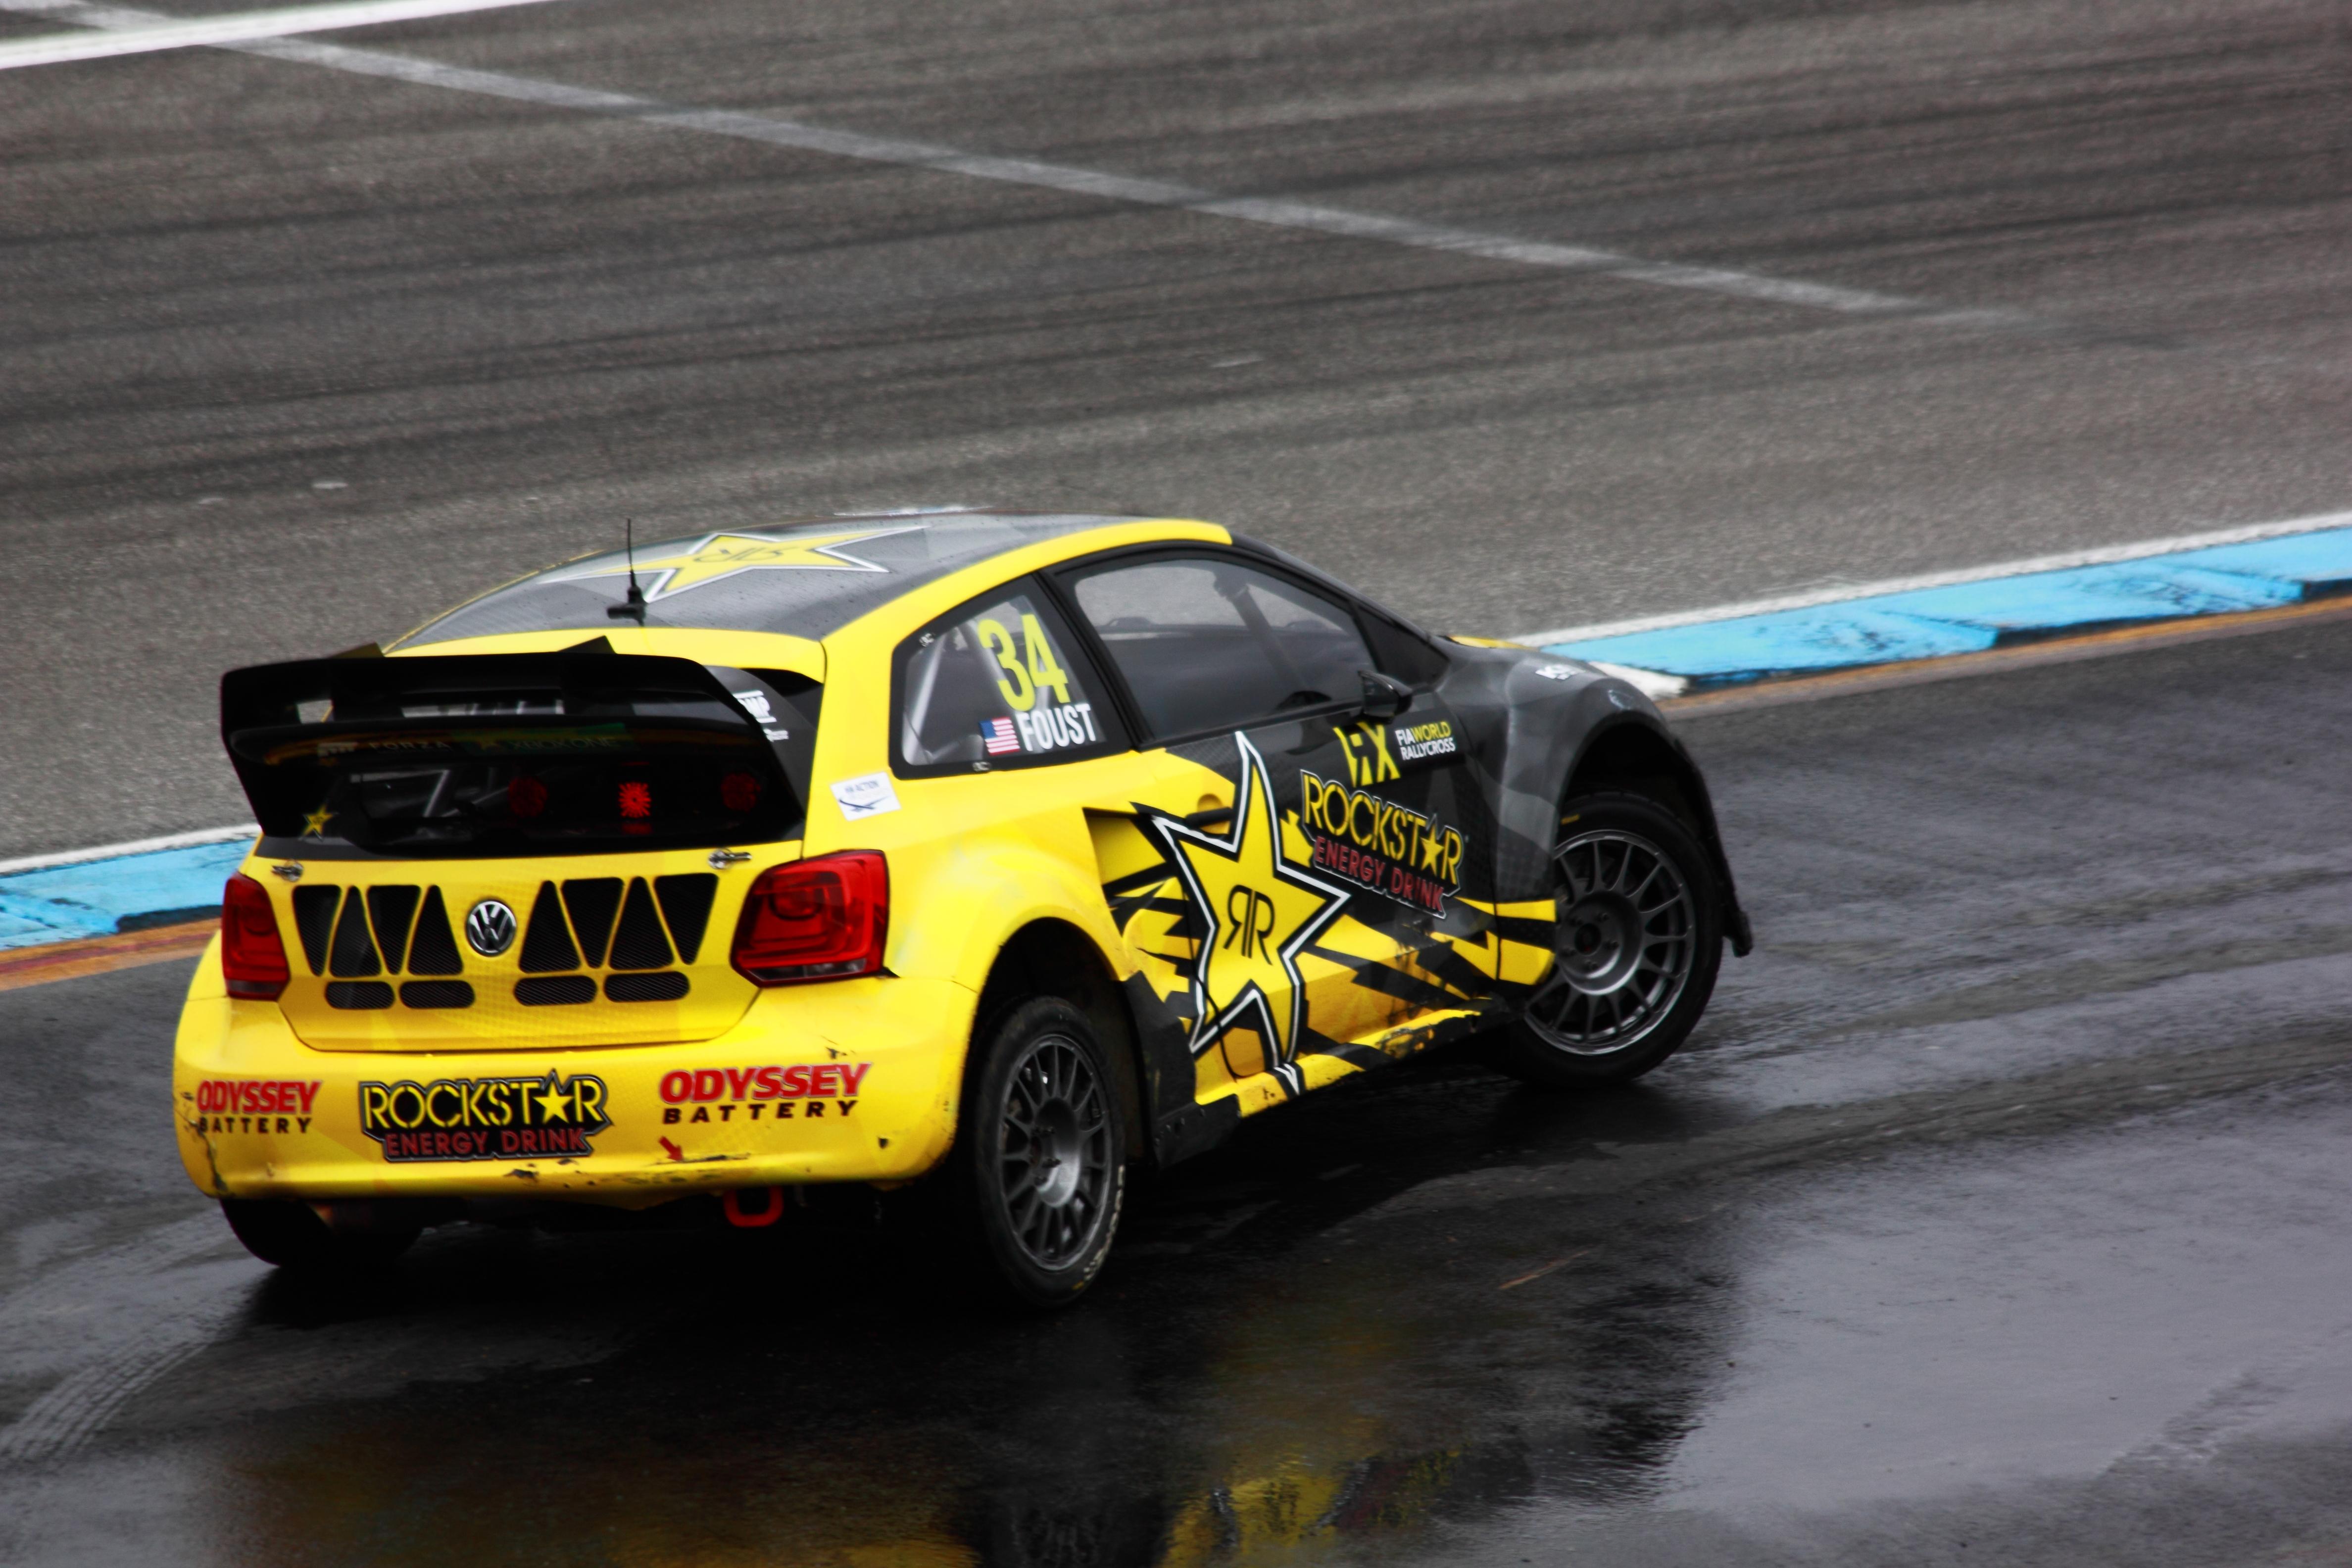 Tanner Foust Vw >> File Tanner Foust Vw Polo Rx Marklund Motorsport